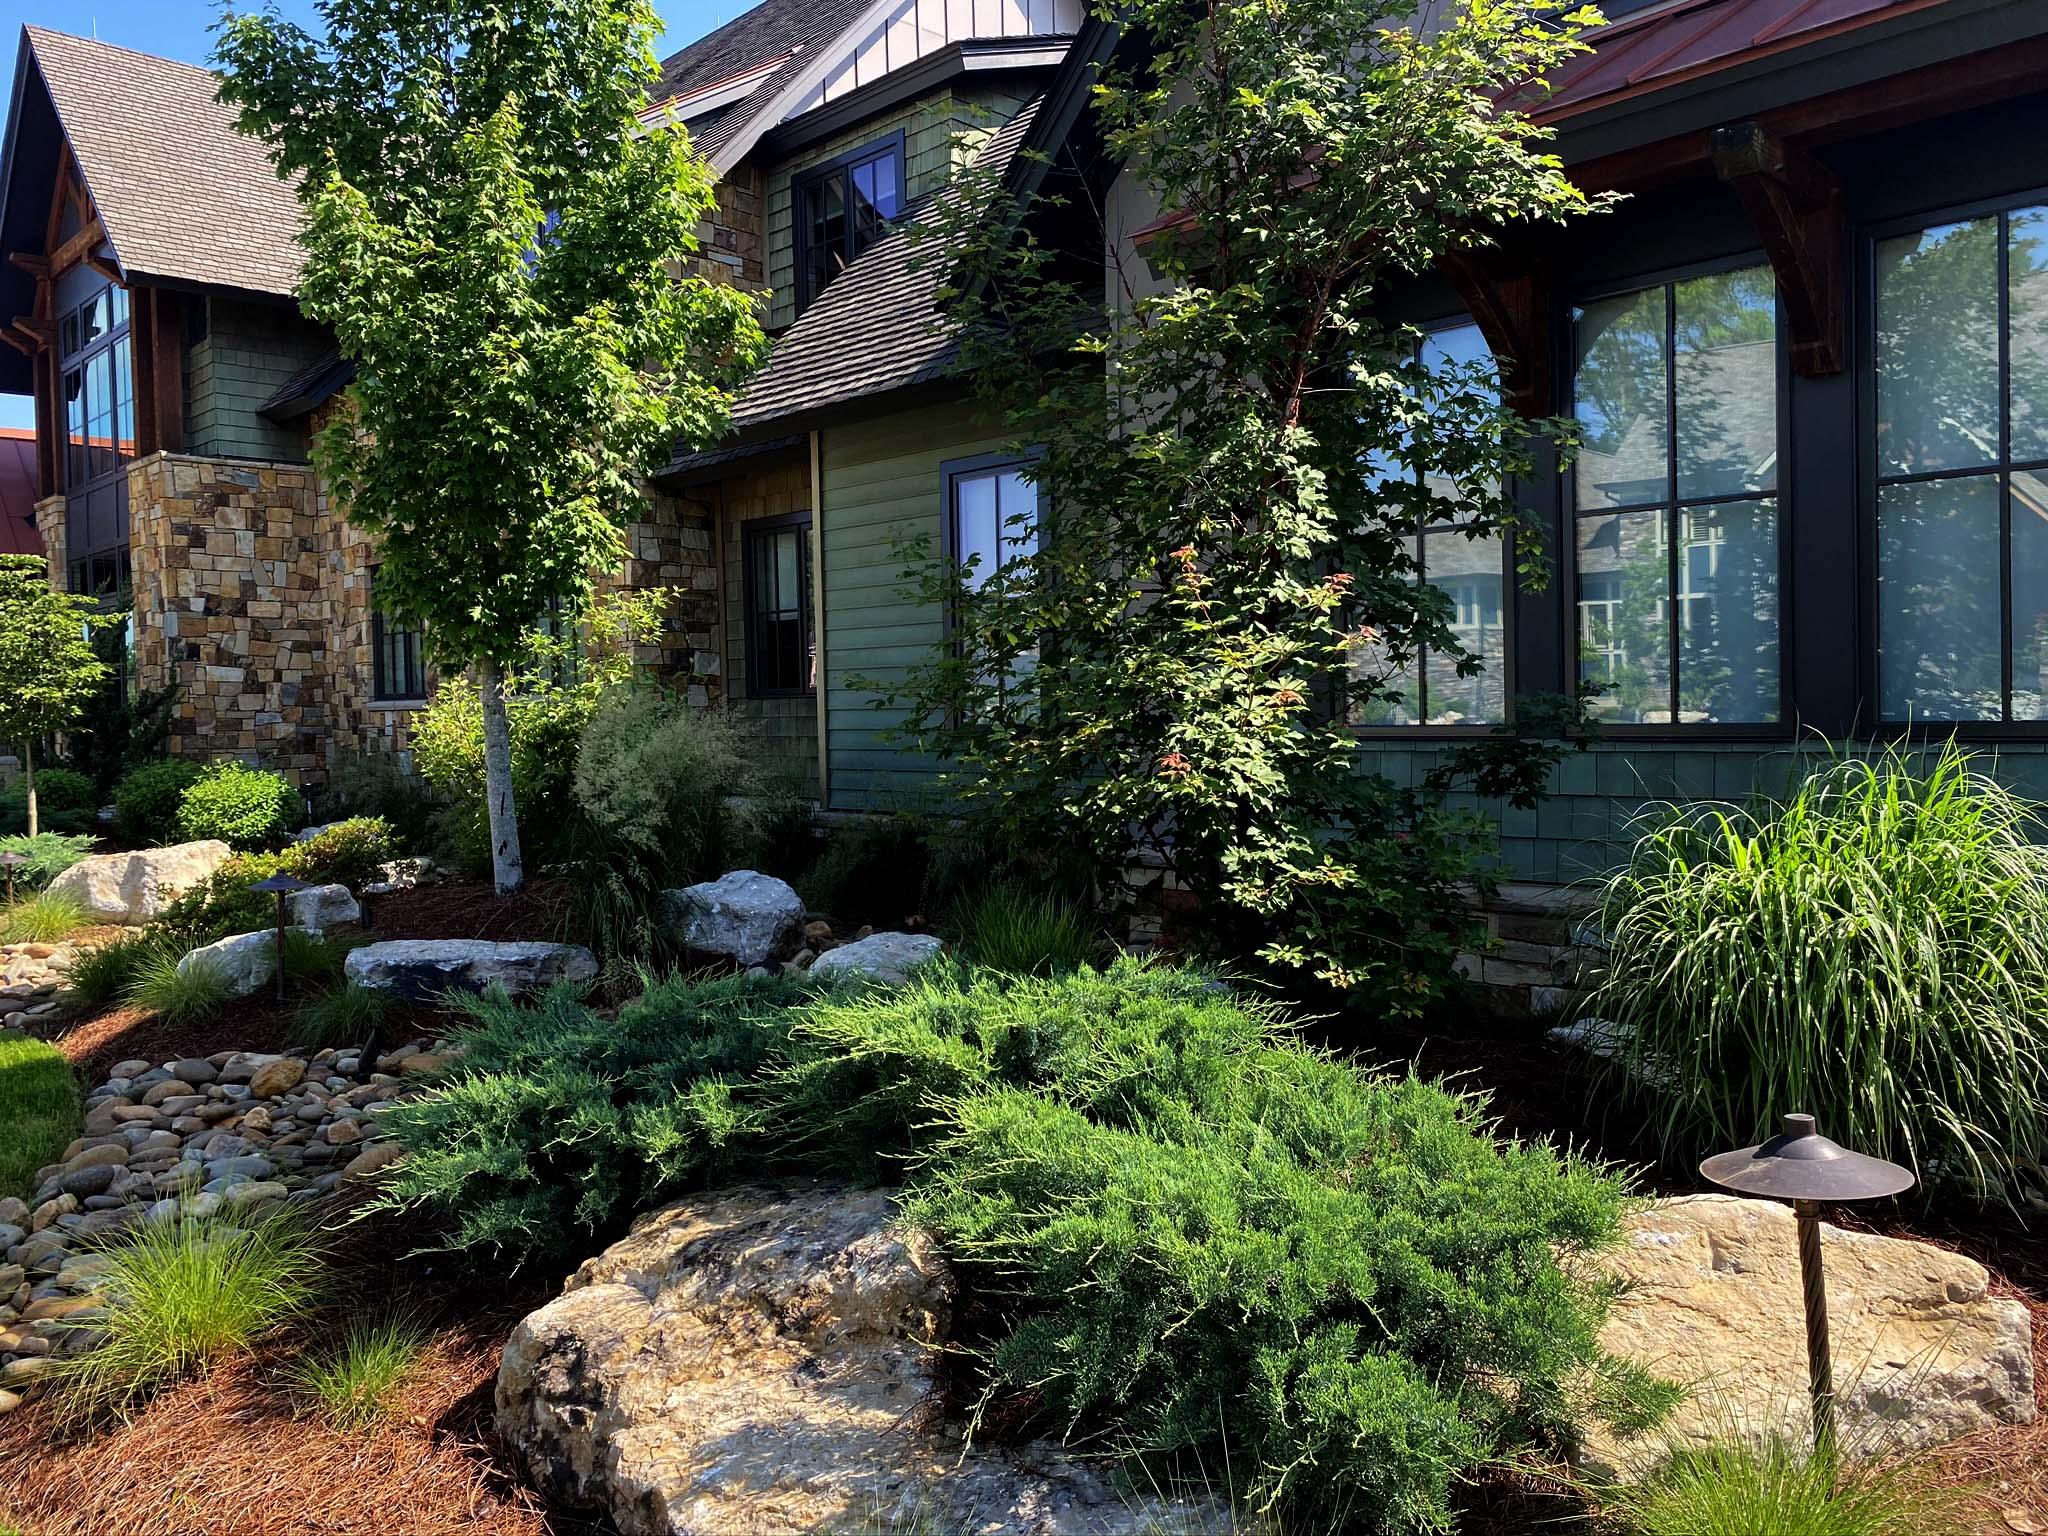 Glenview Park Way Residence